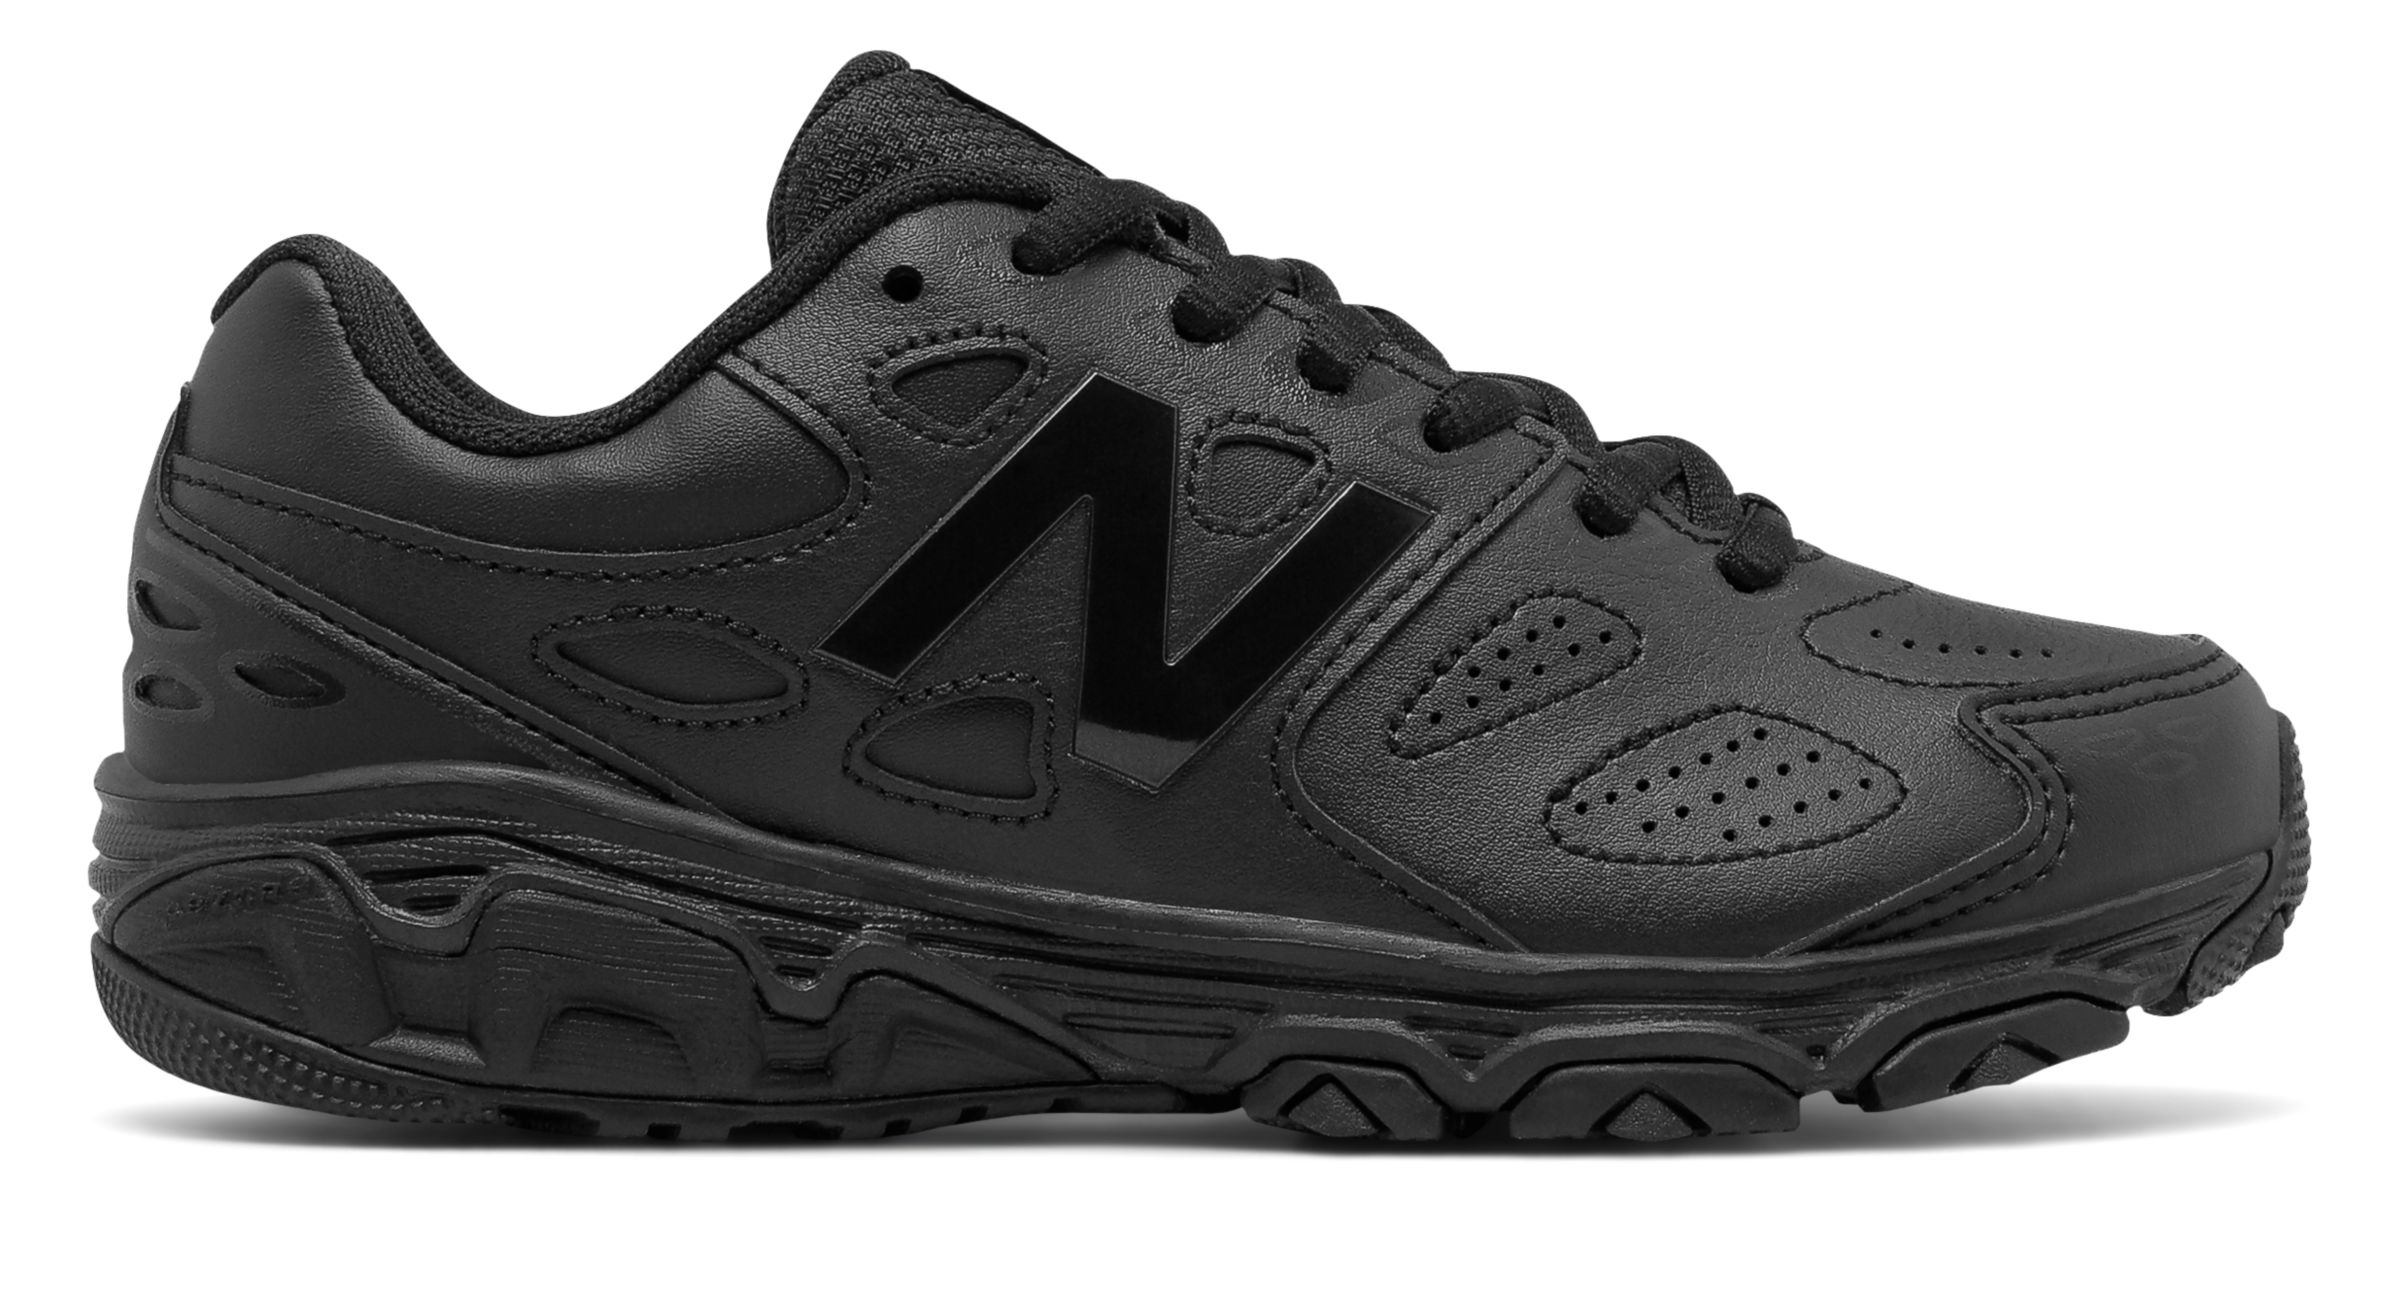 NB New Balance 680v3, Black